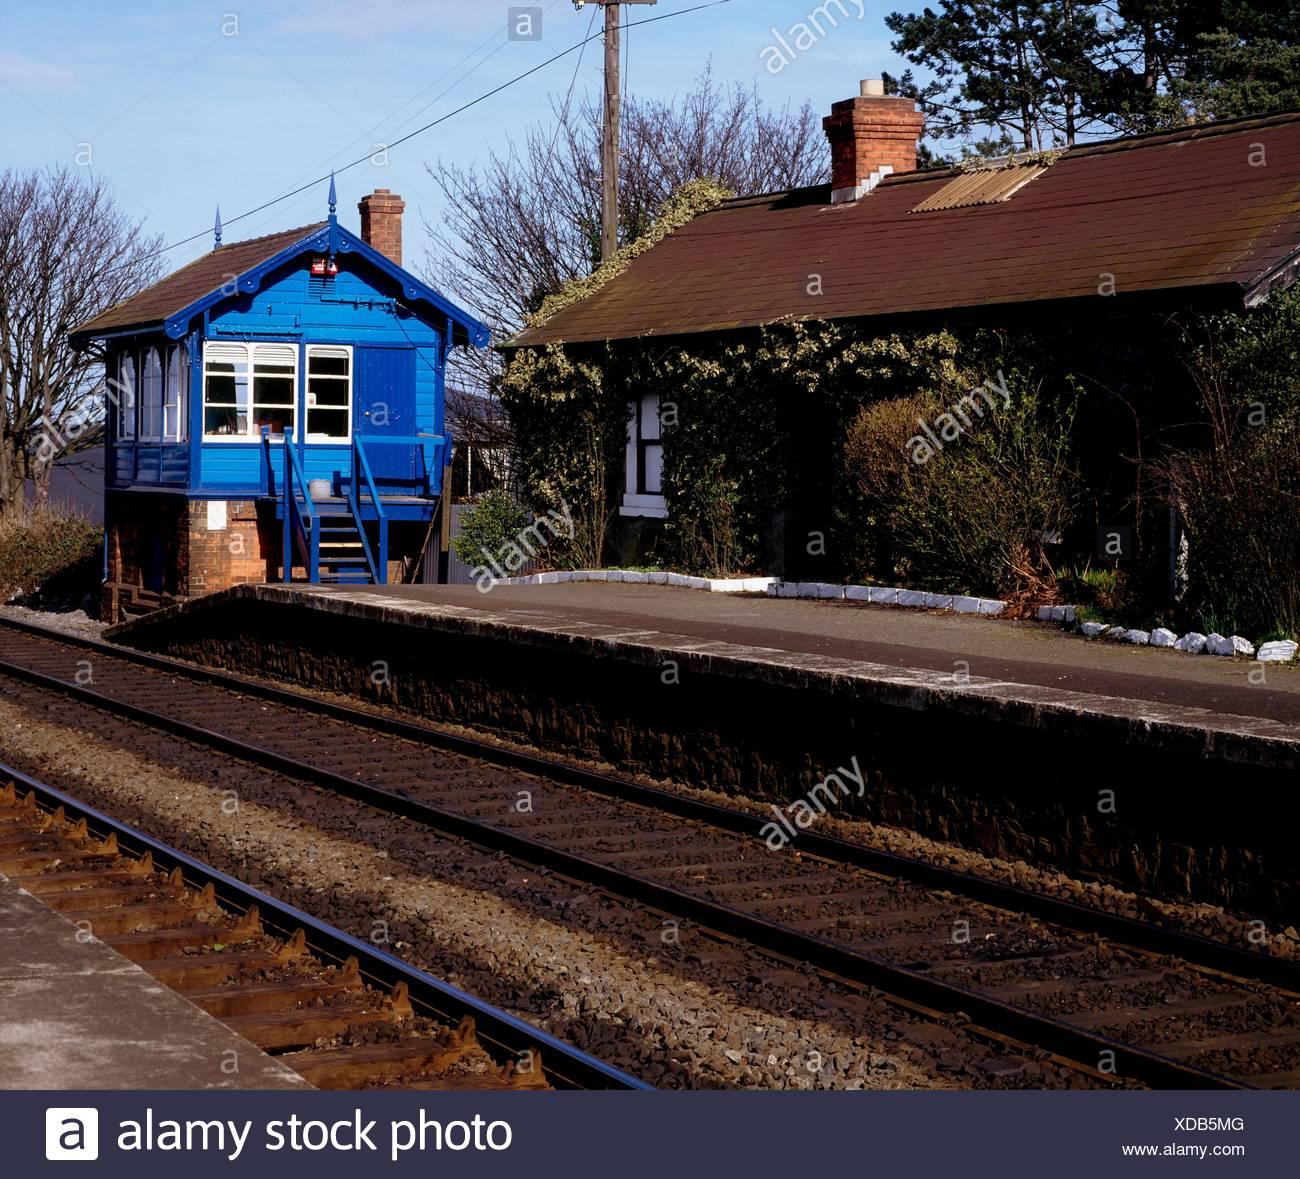 Malahide, Co Dublin, Ireland; Signal Box At A Railway Station - Stock Image